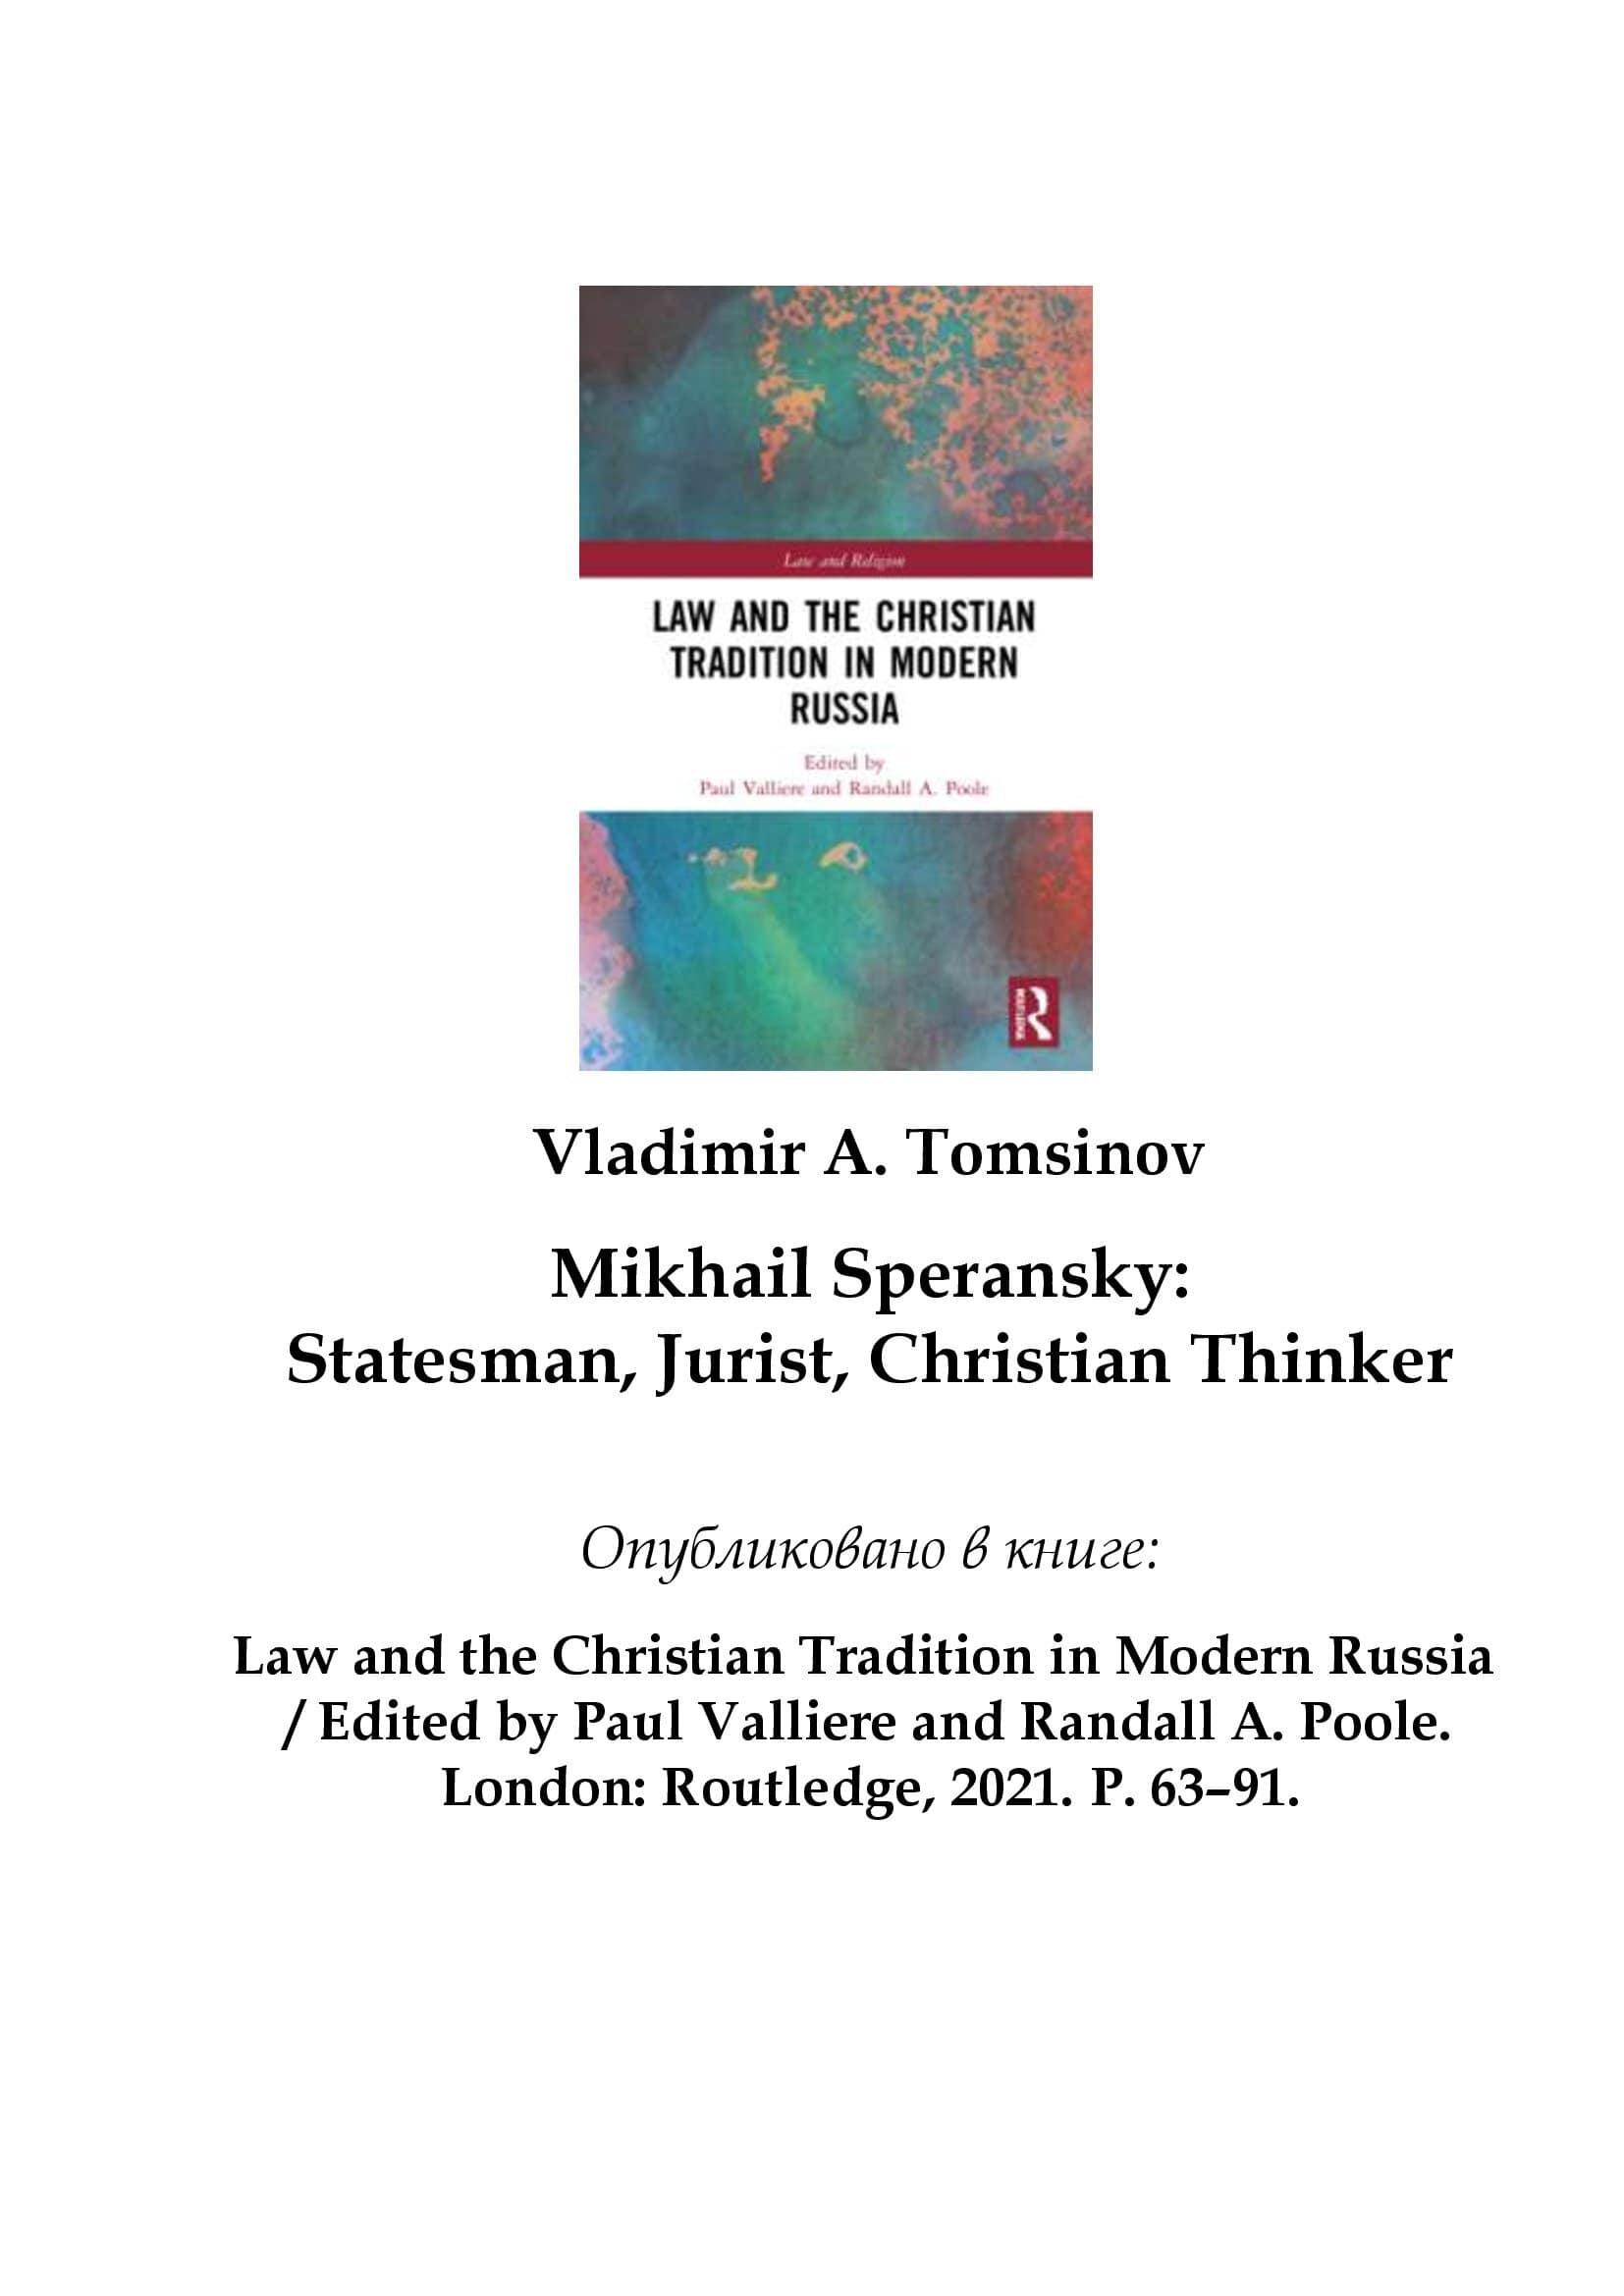 Tomsinov V.A. Speransky. Statesman, Jurist, Christian Thinker